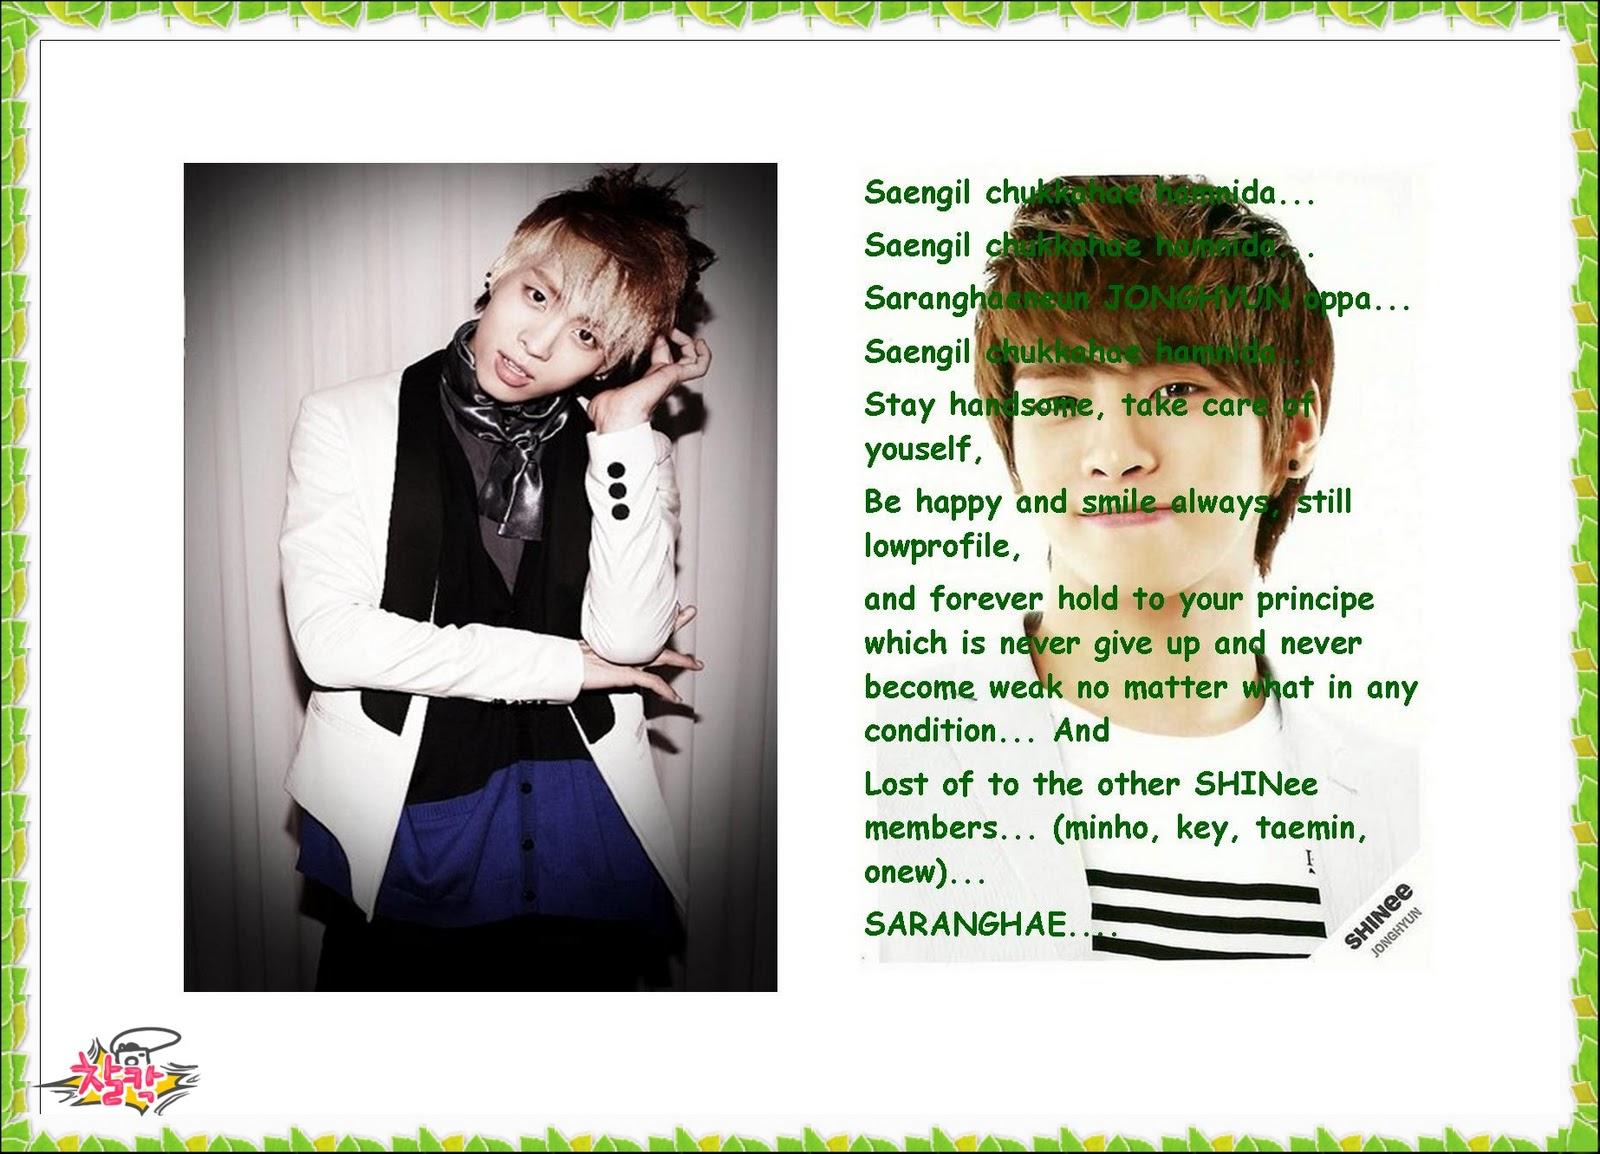 kartu ucapan selamat ulang tahun untuk jonghyun oppa.